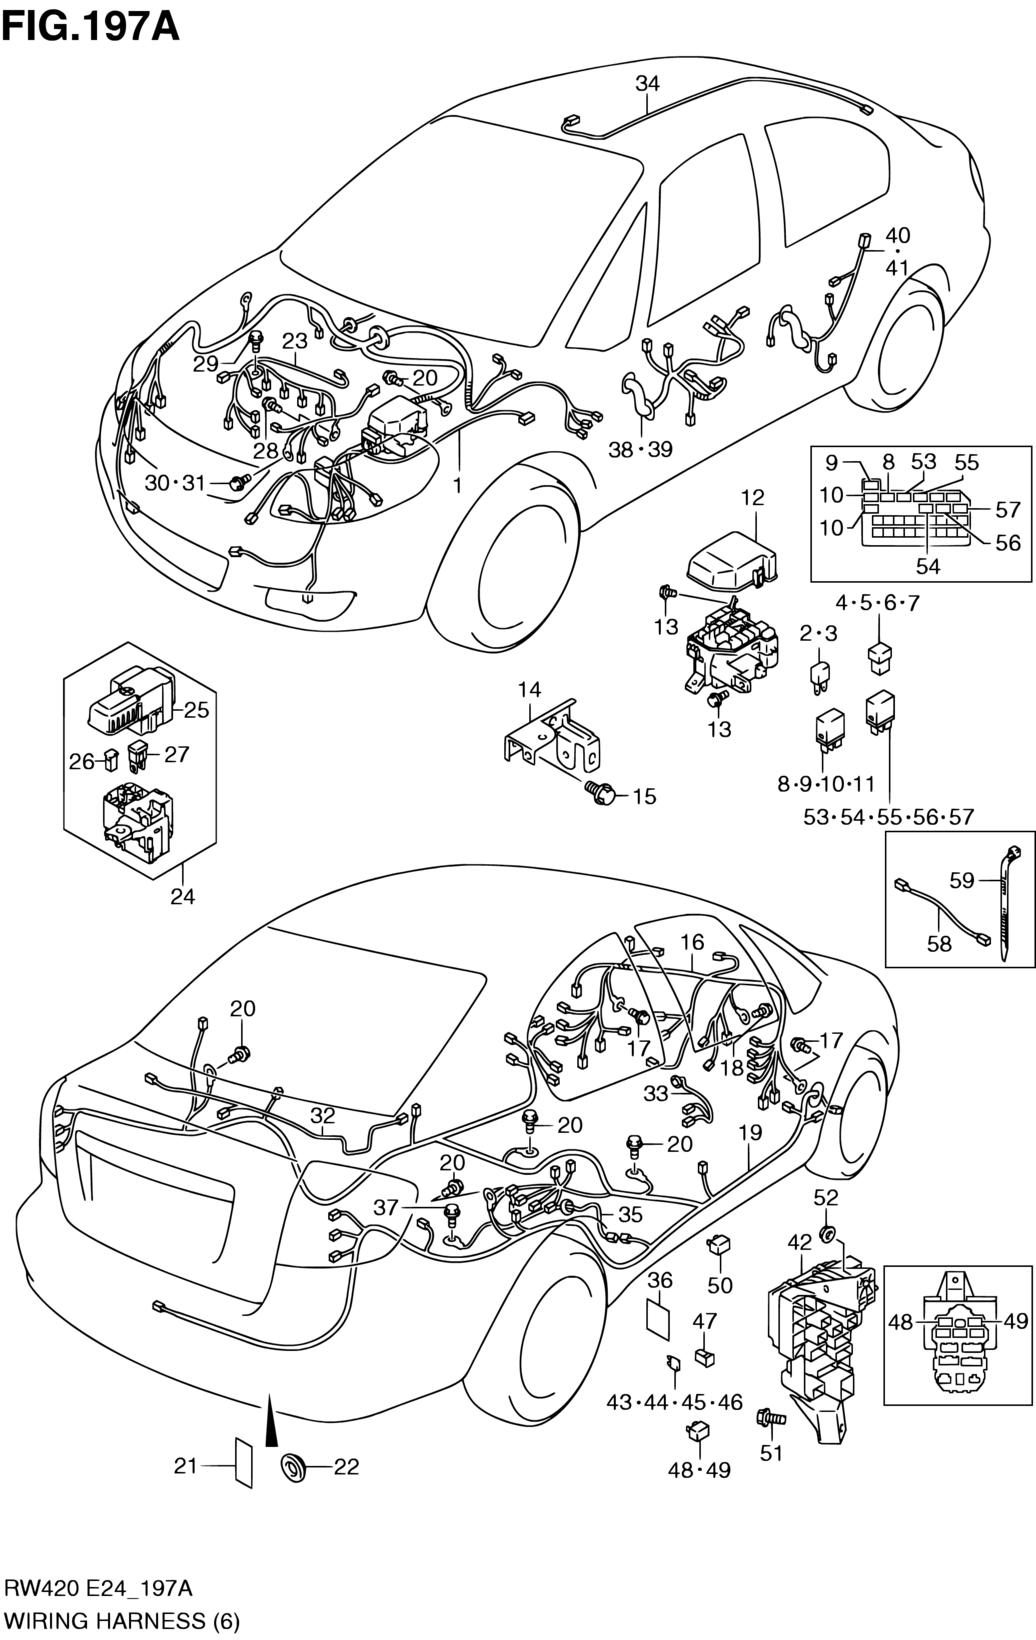 Europe, SX4, RW416-6 (E30,E38), Electrical, 197A - WIRING